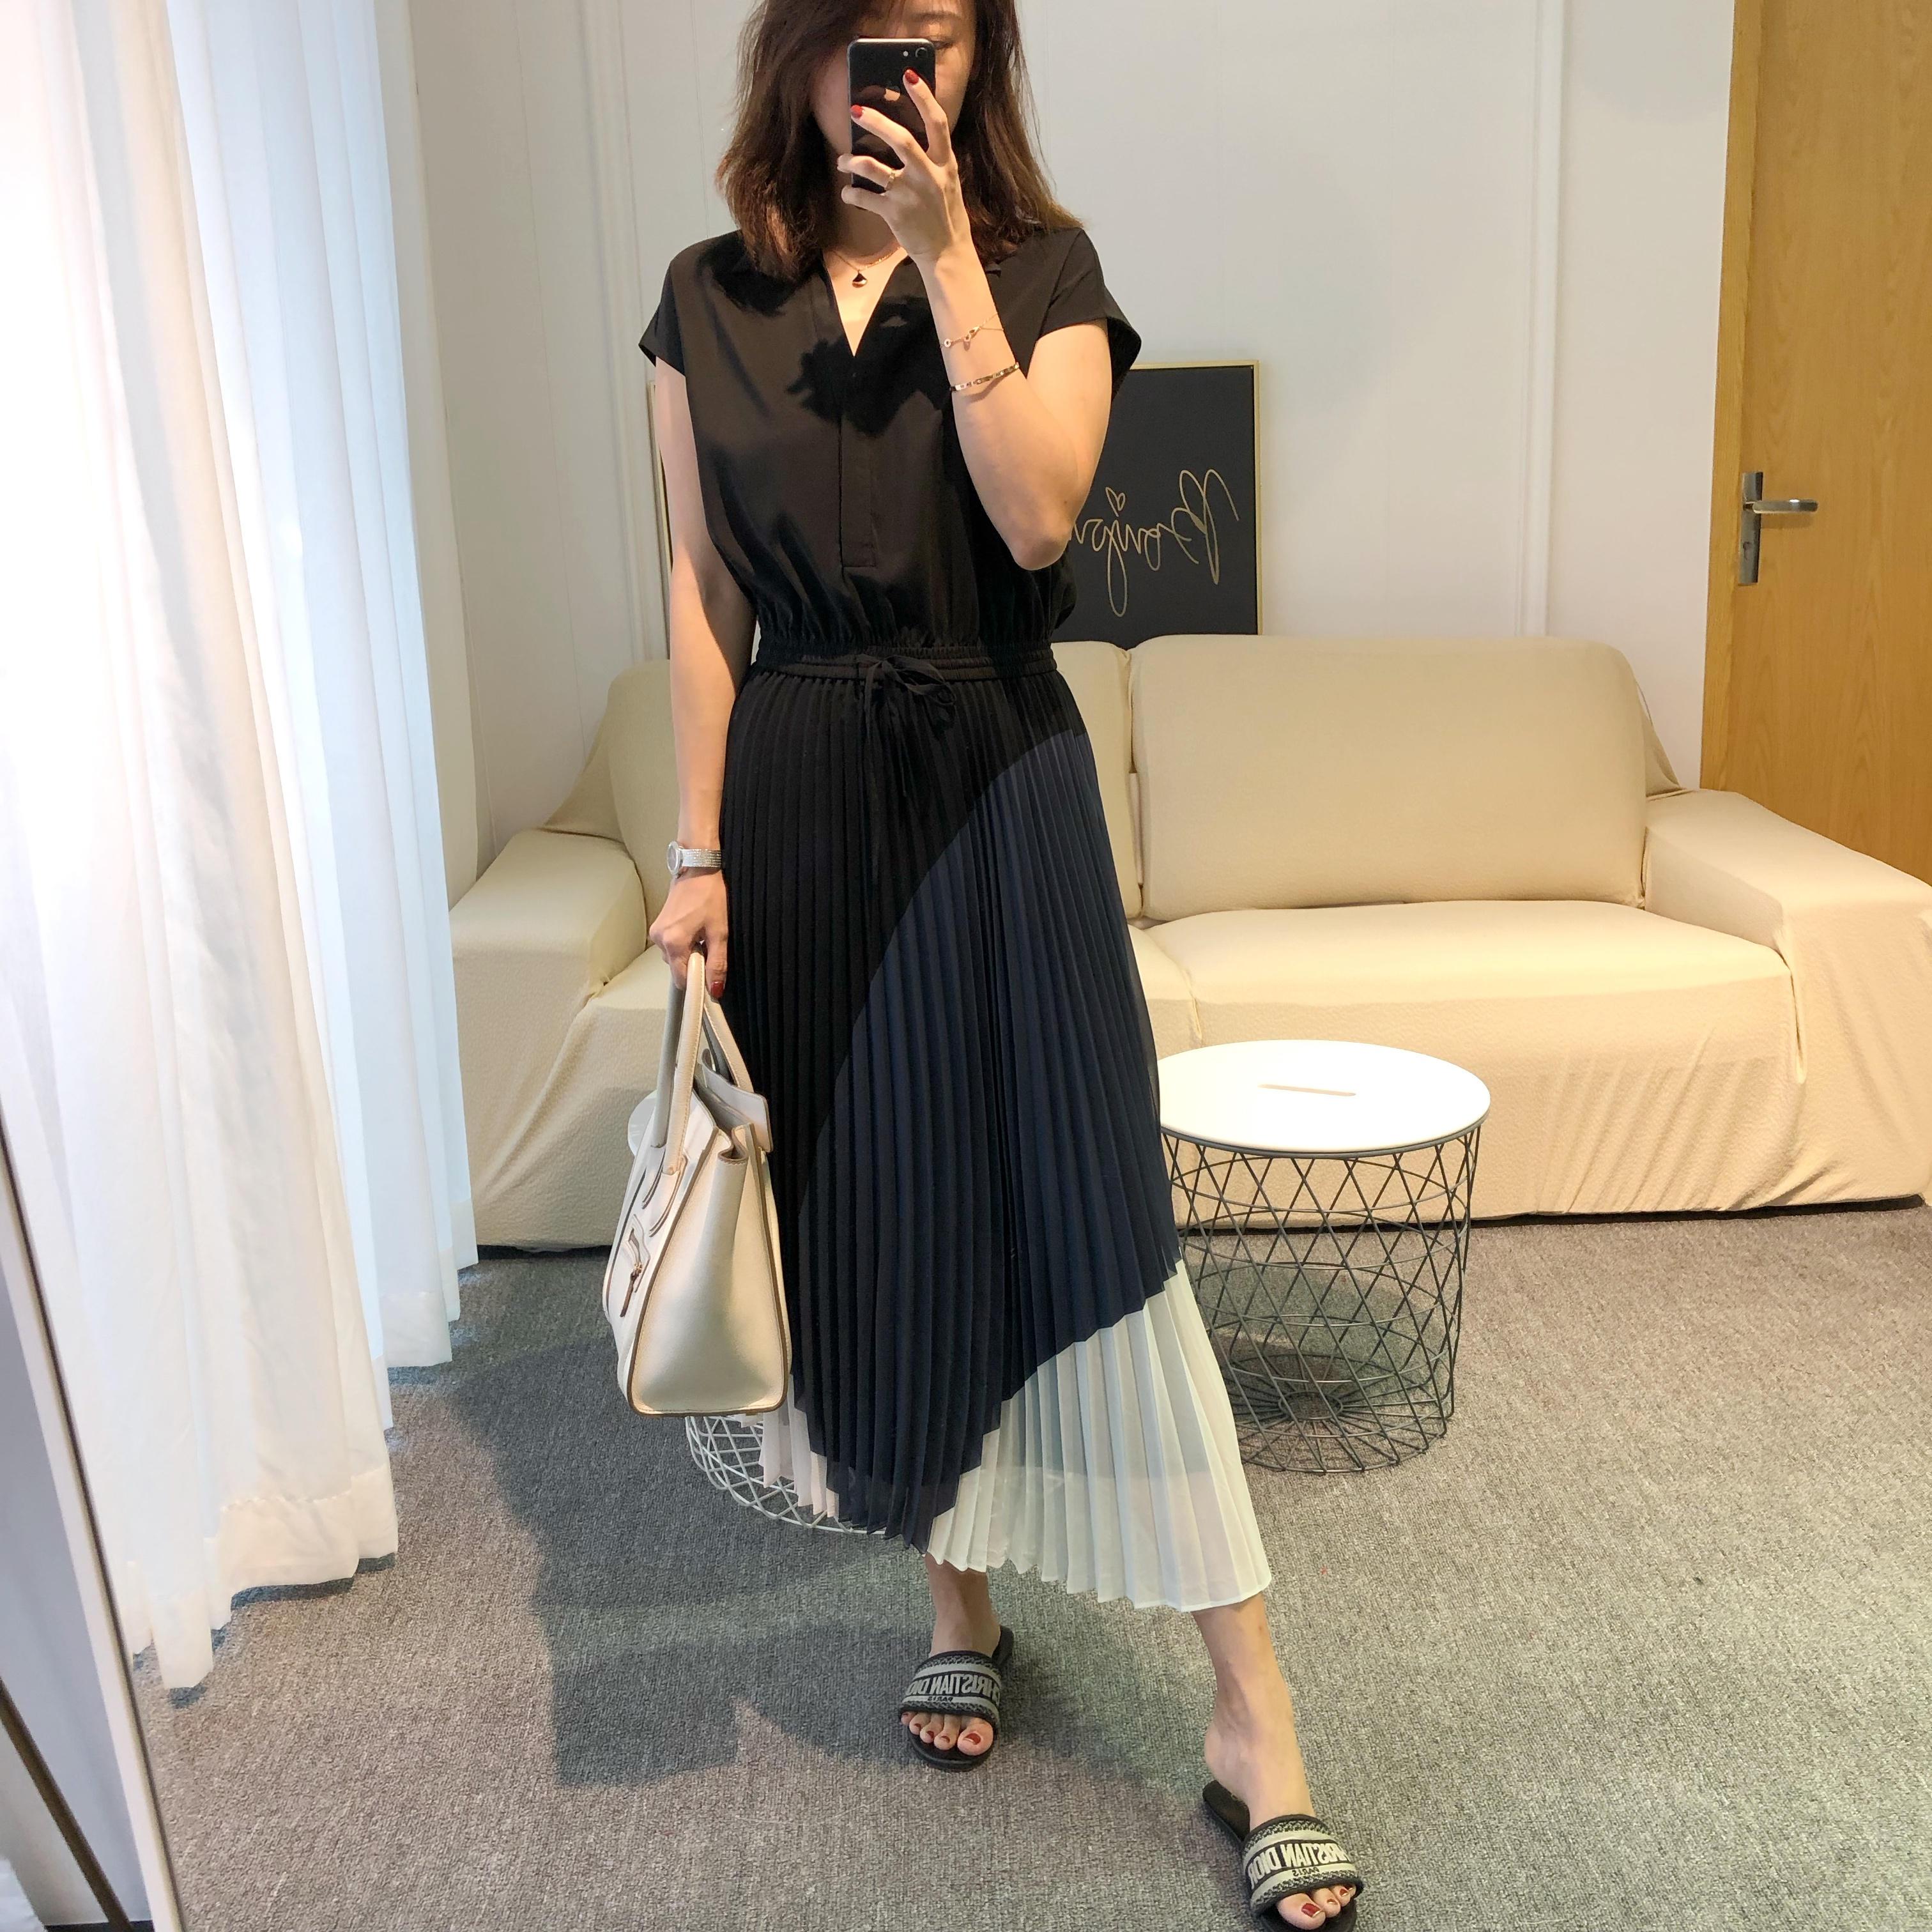 Tina Lee pure Canadian Club Princess Megan same shirt color contrast pleated long dress